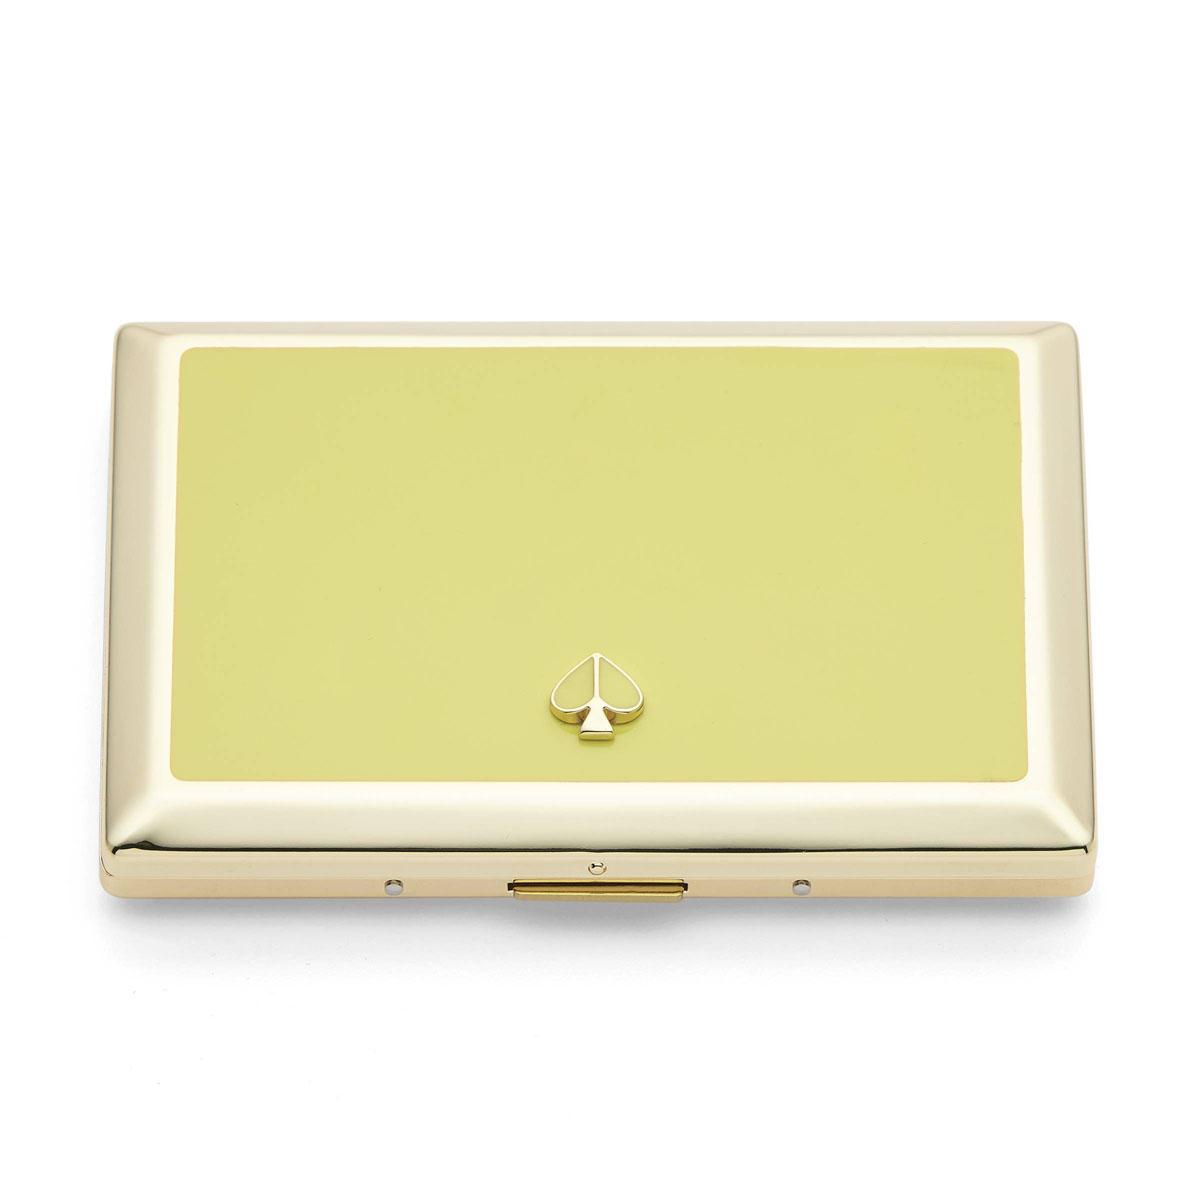 Kate Spade New York, Lenox Spade Street Gold Business Card Holder, Citron